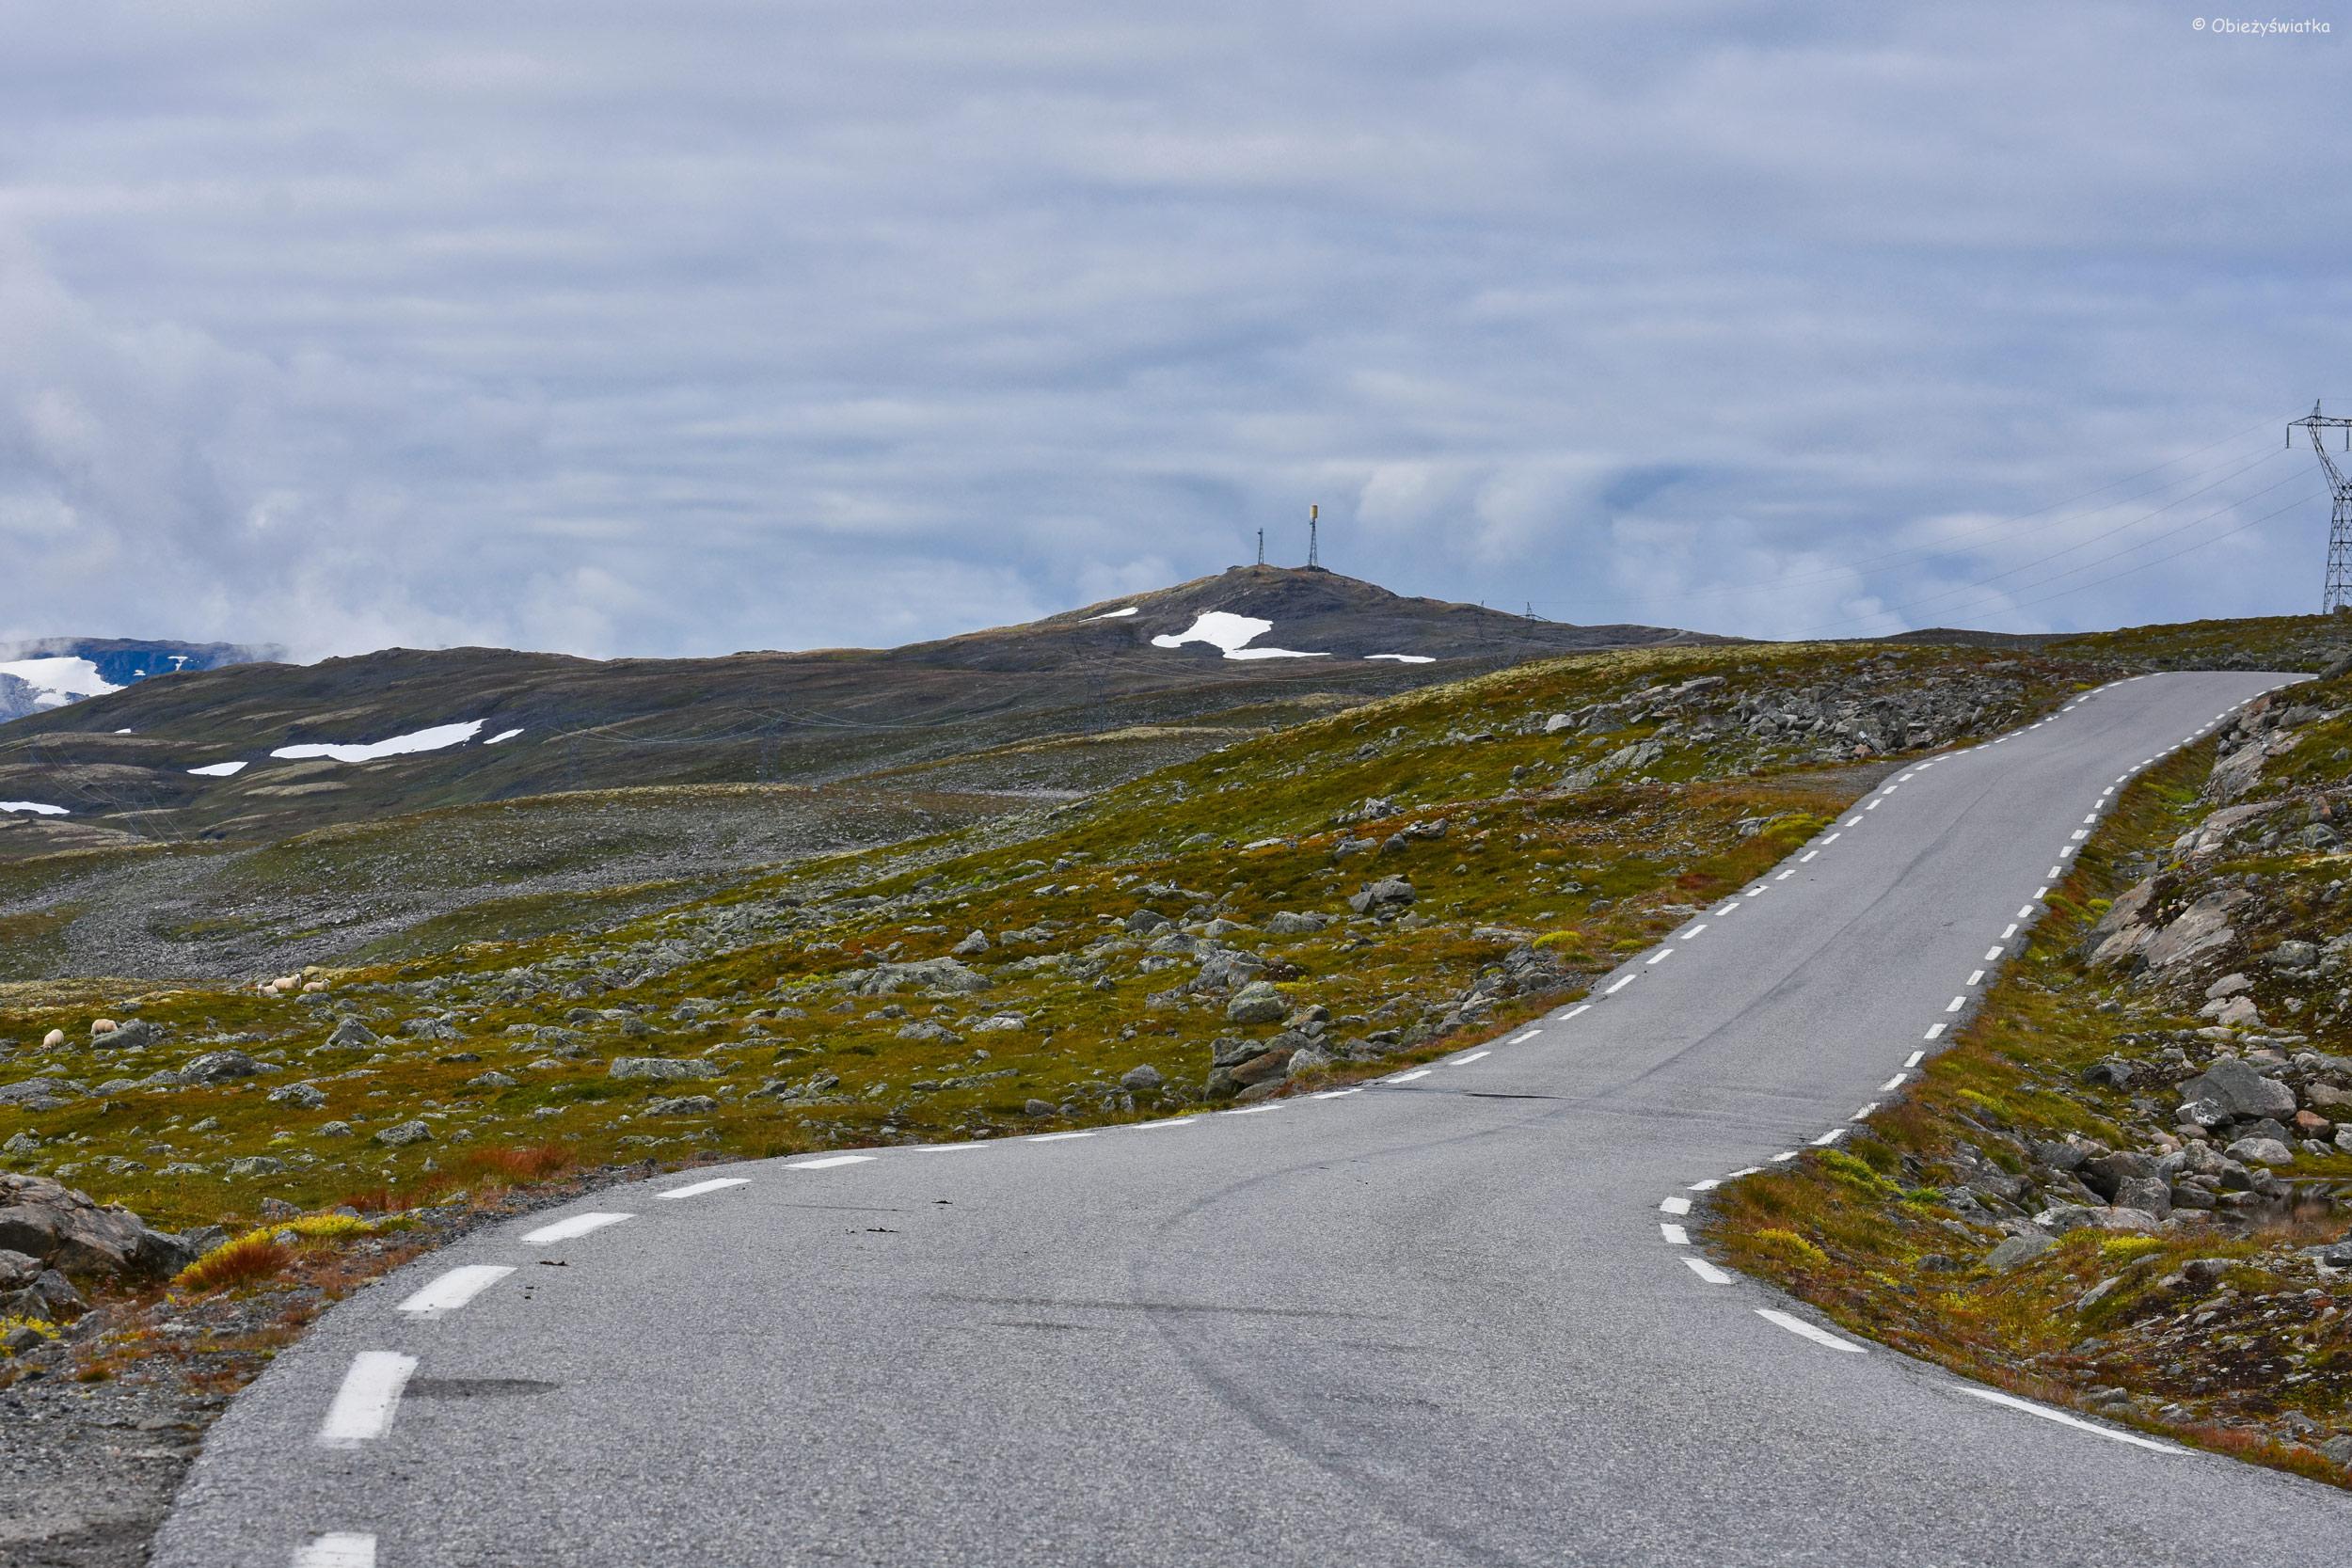 Aurlandsfjellet, Norwegia